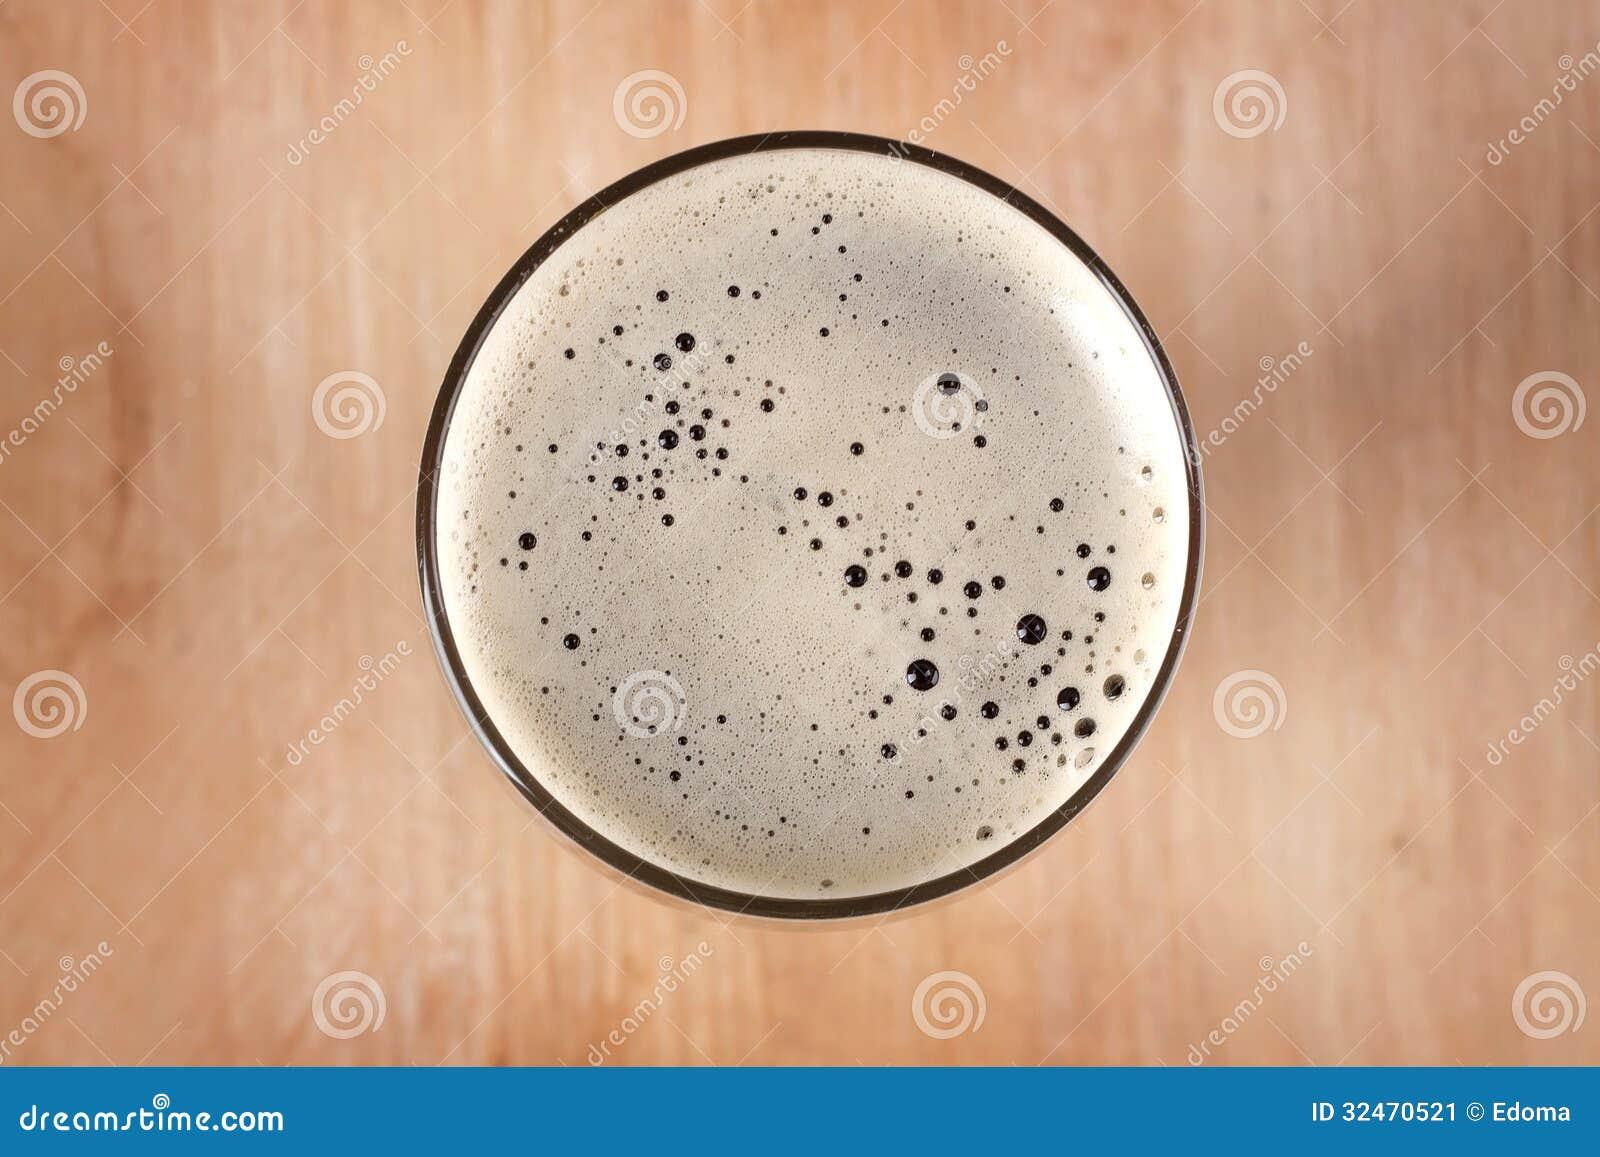 Glass Of Dark Beer Stock Image - Image: 32470521